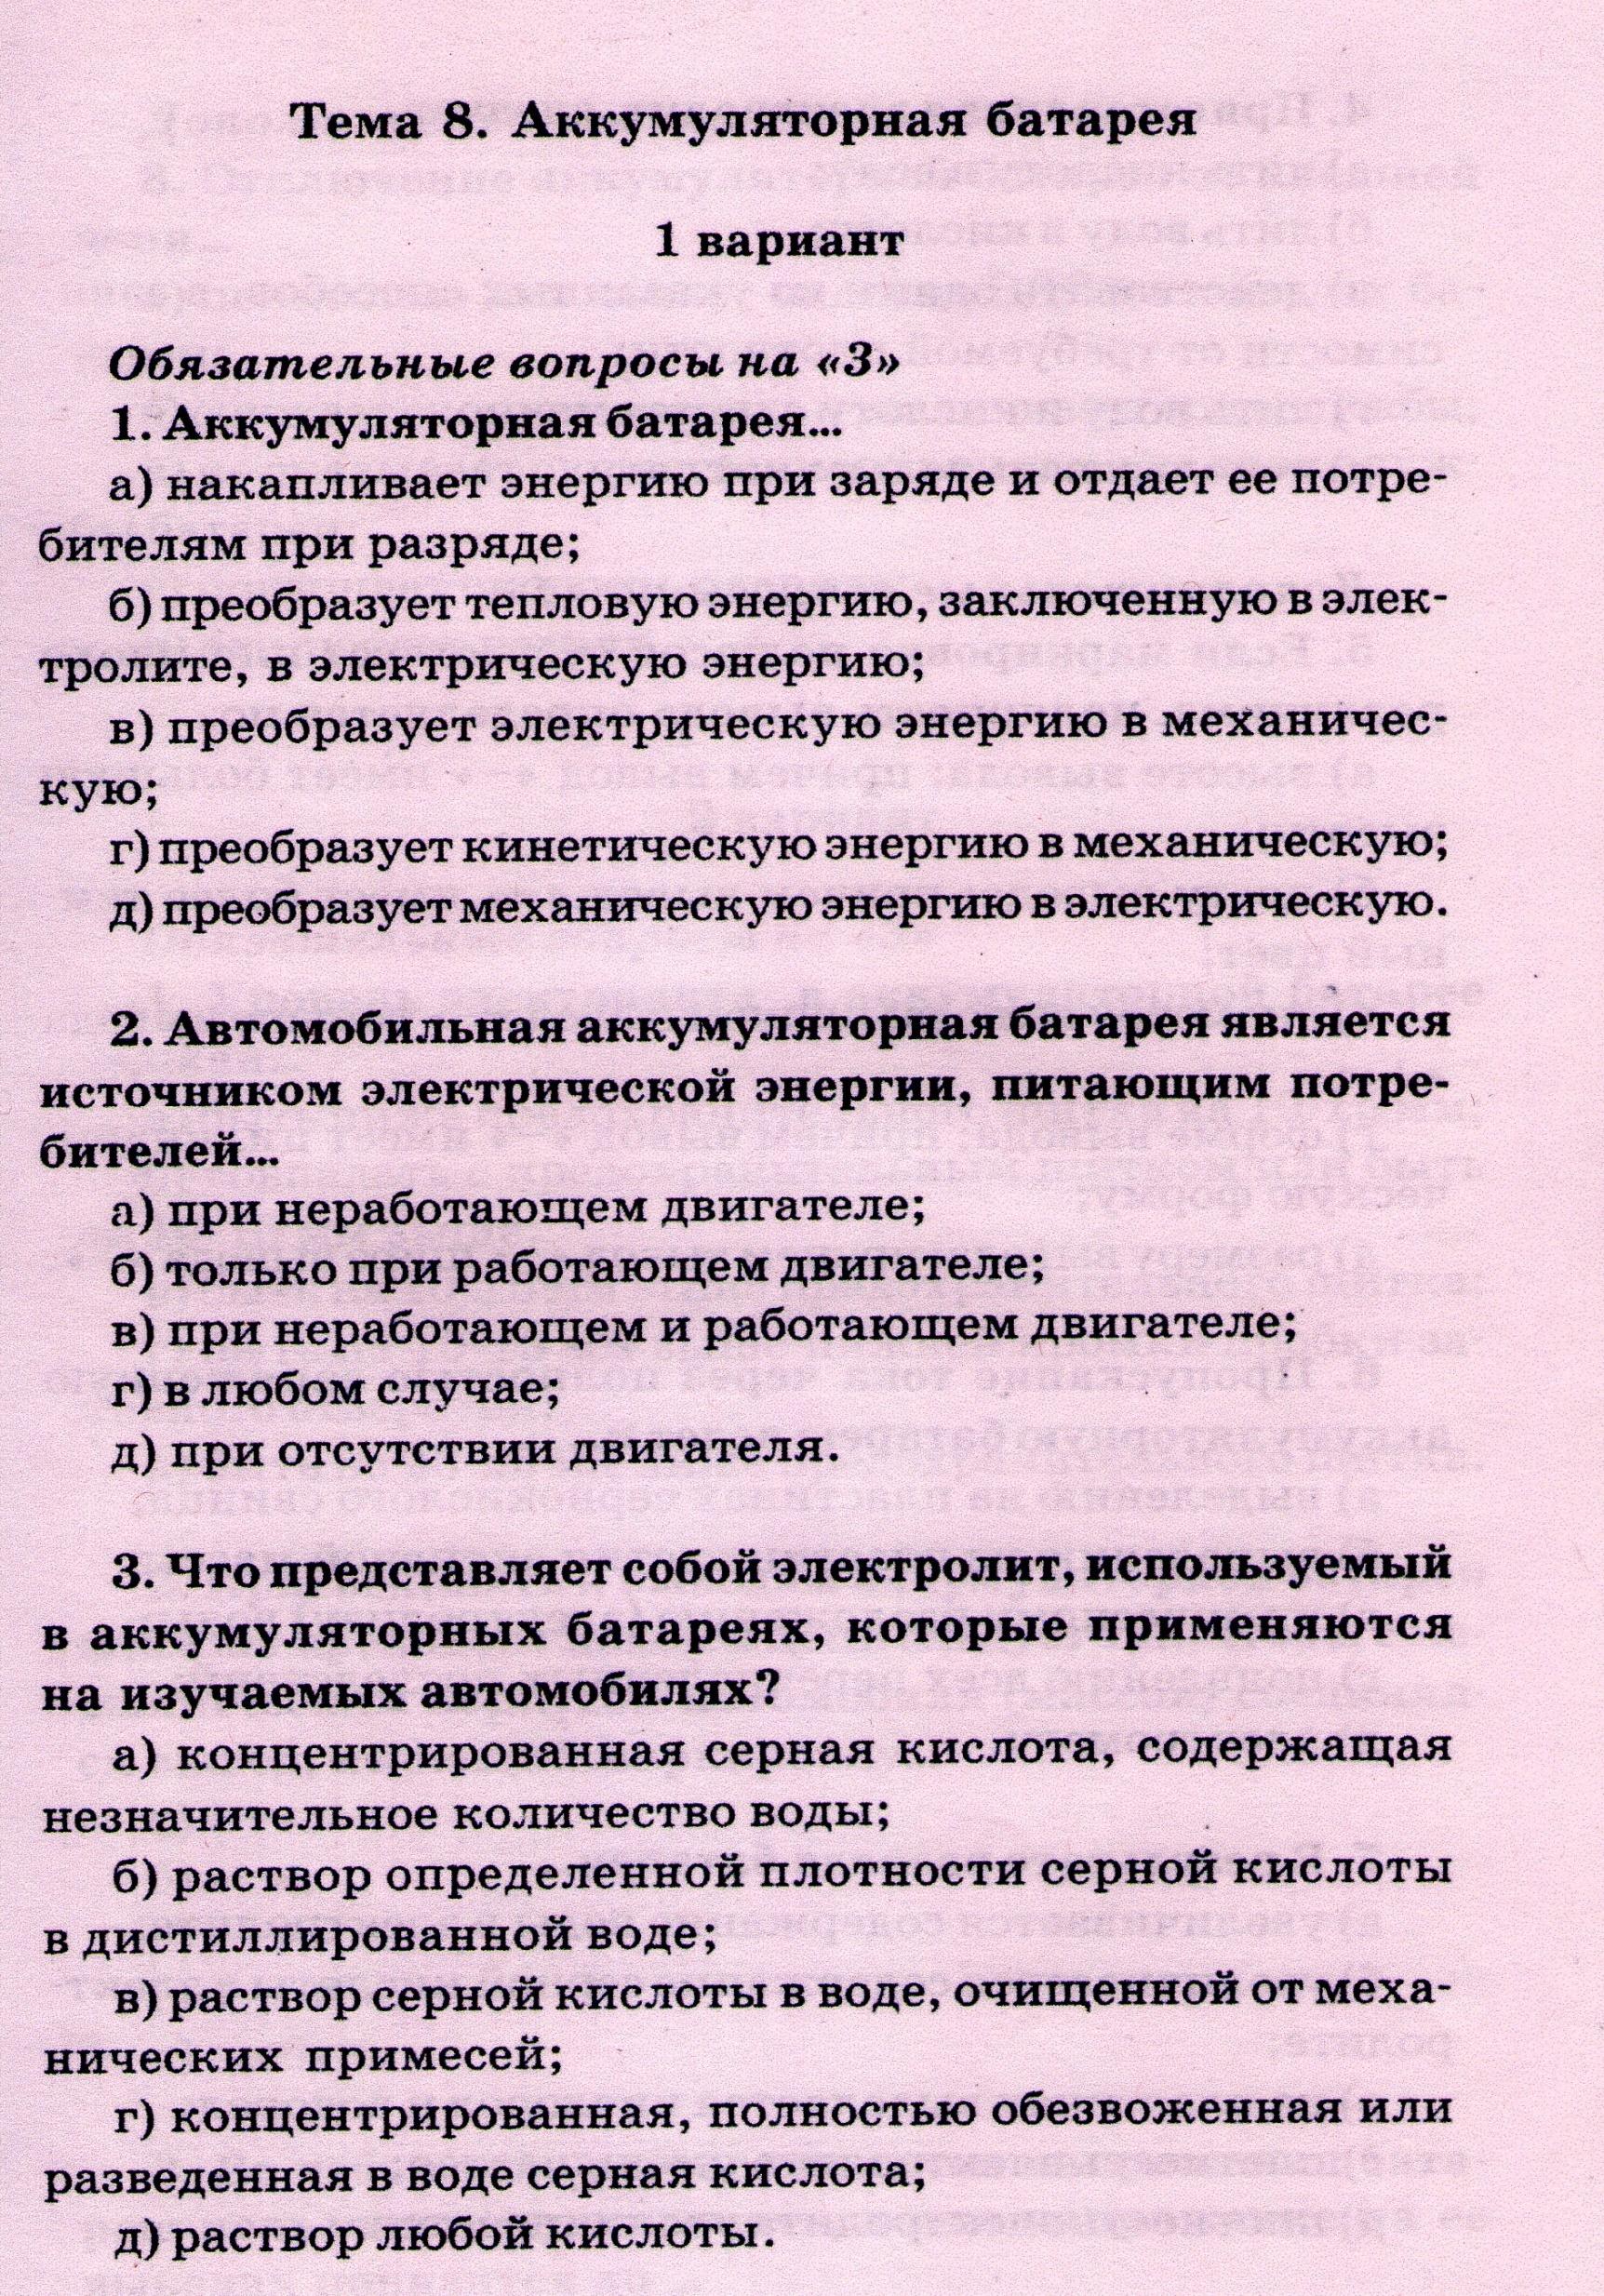 C:\Users\Василий Мельченко\Pictures\img539.jpg